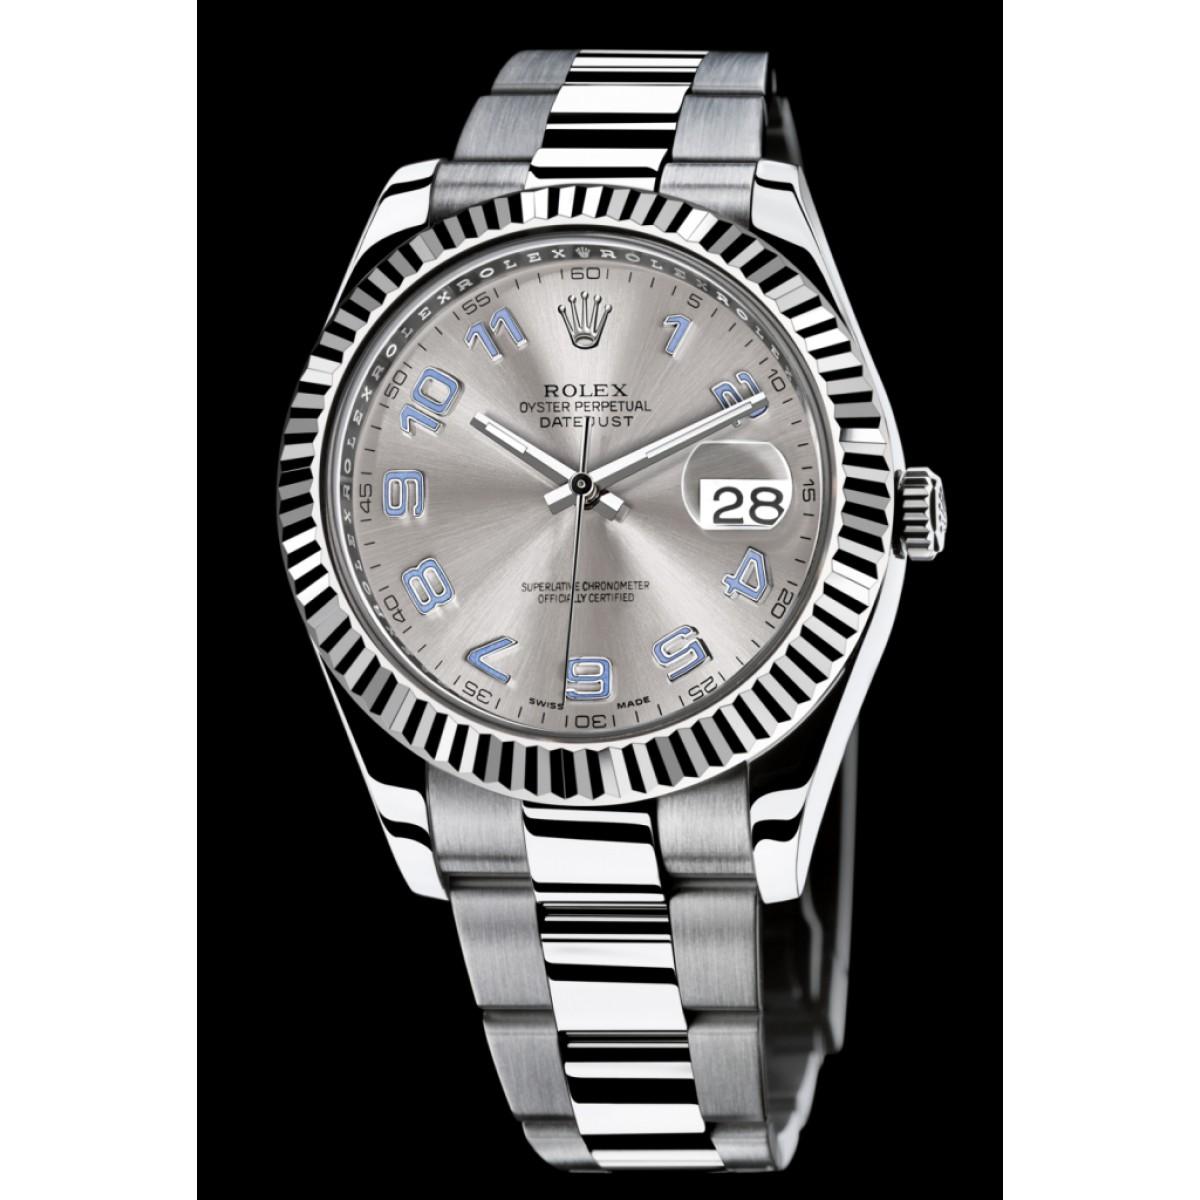 987c4c16af1 Relógio Réplica Rolex DateJust